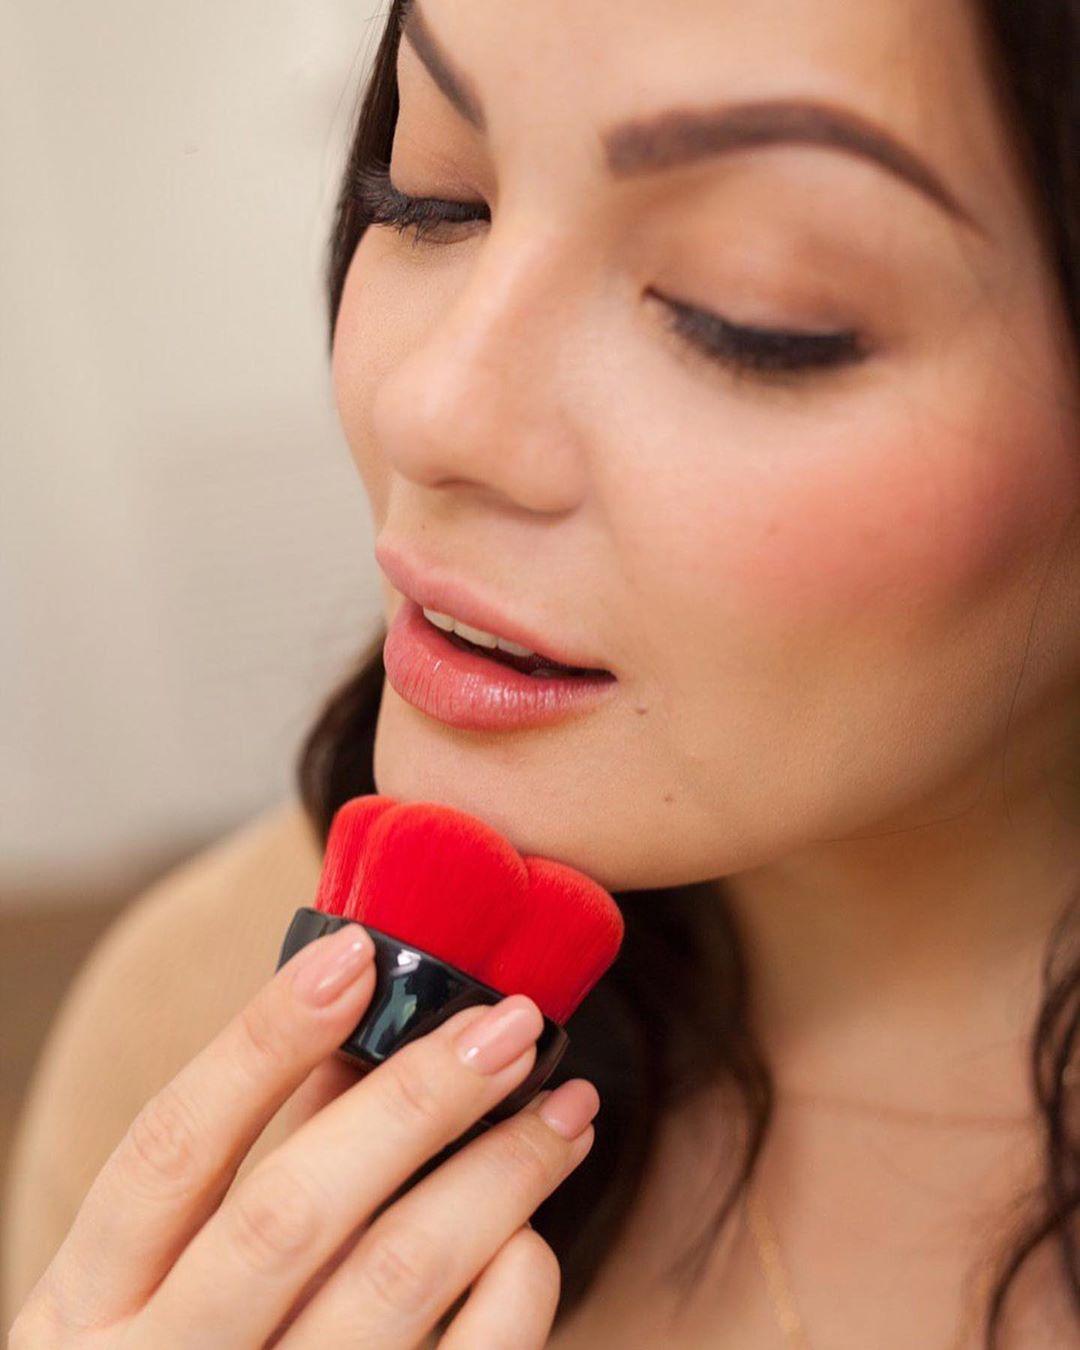 Shiseido muse KC Concepcion